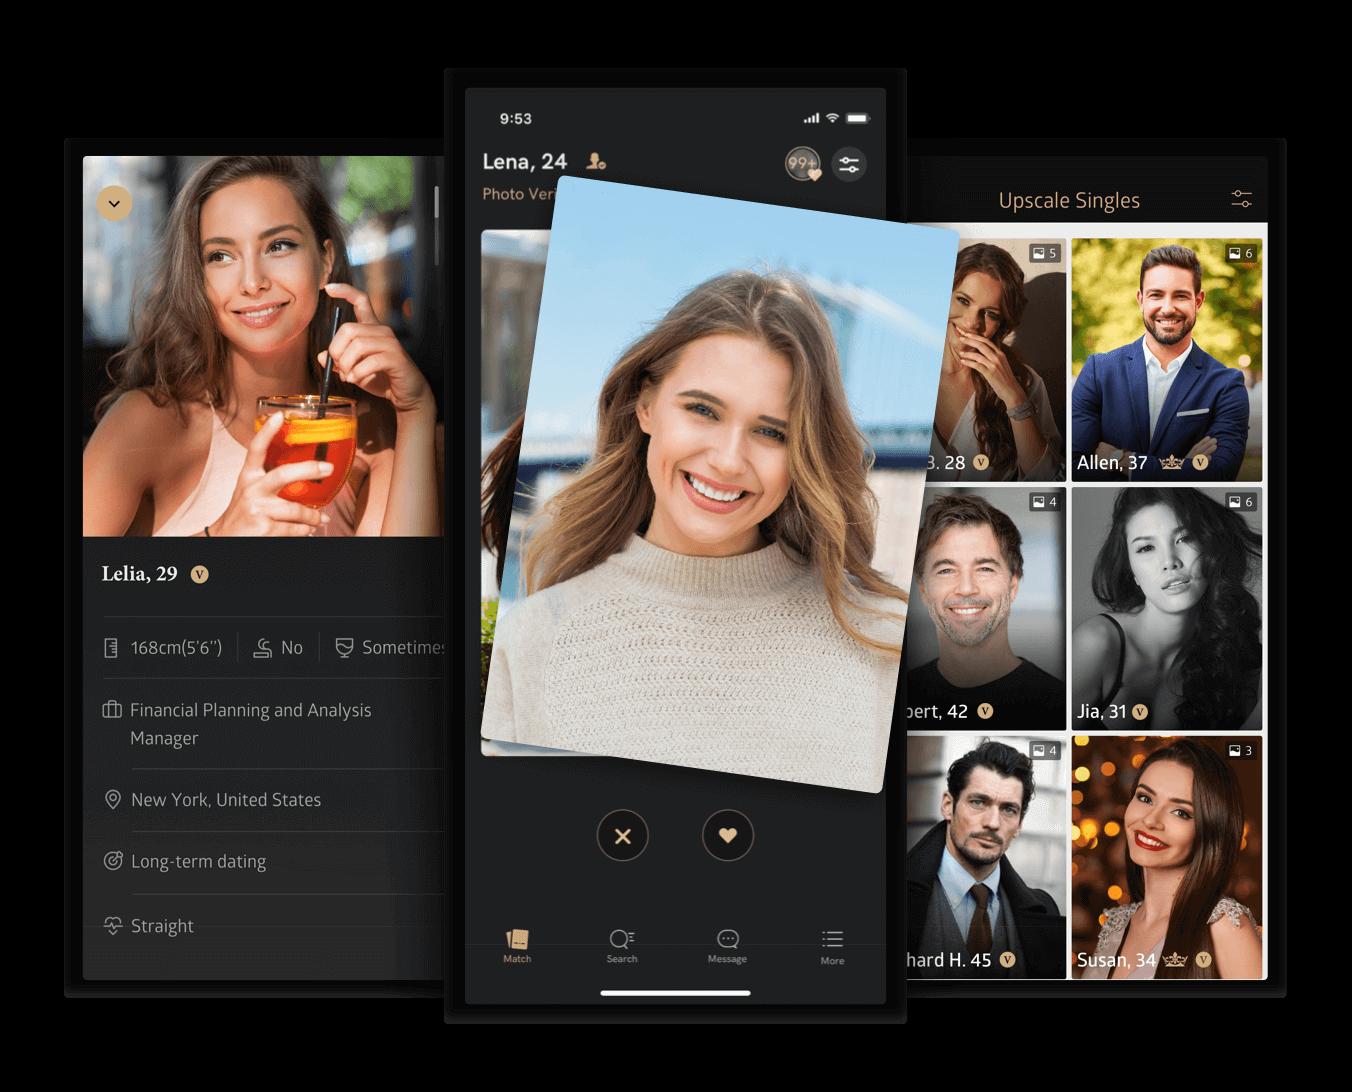 Meet new people on Luxy dating app